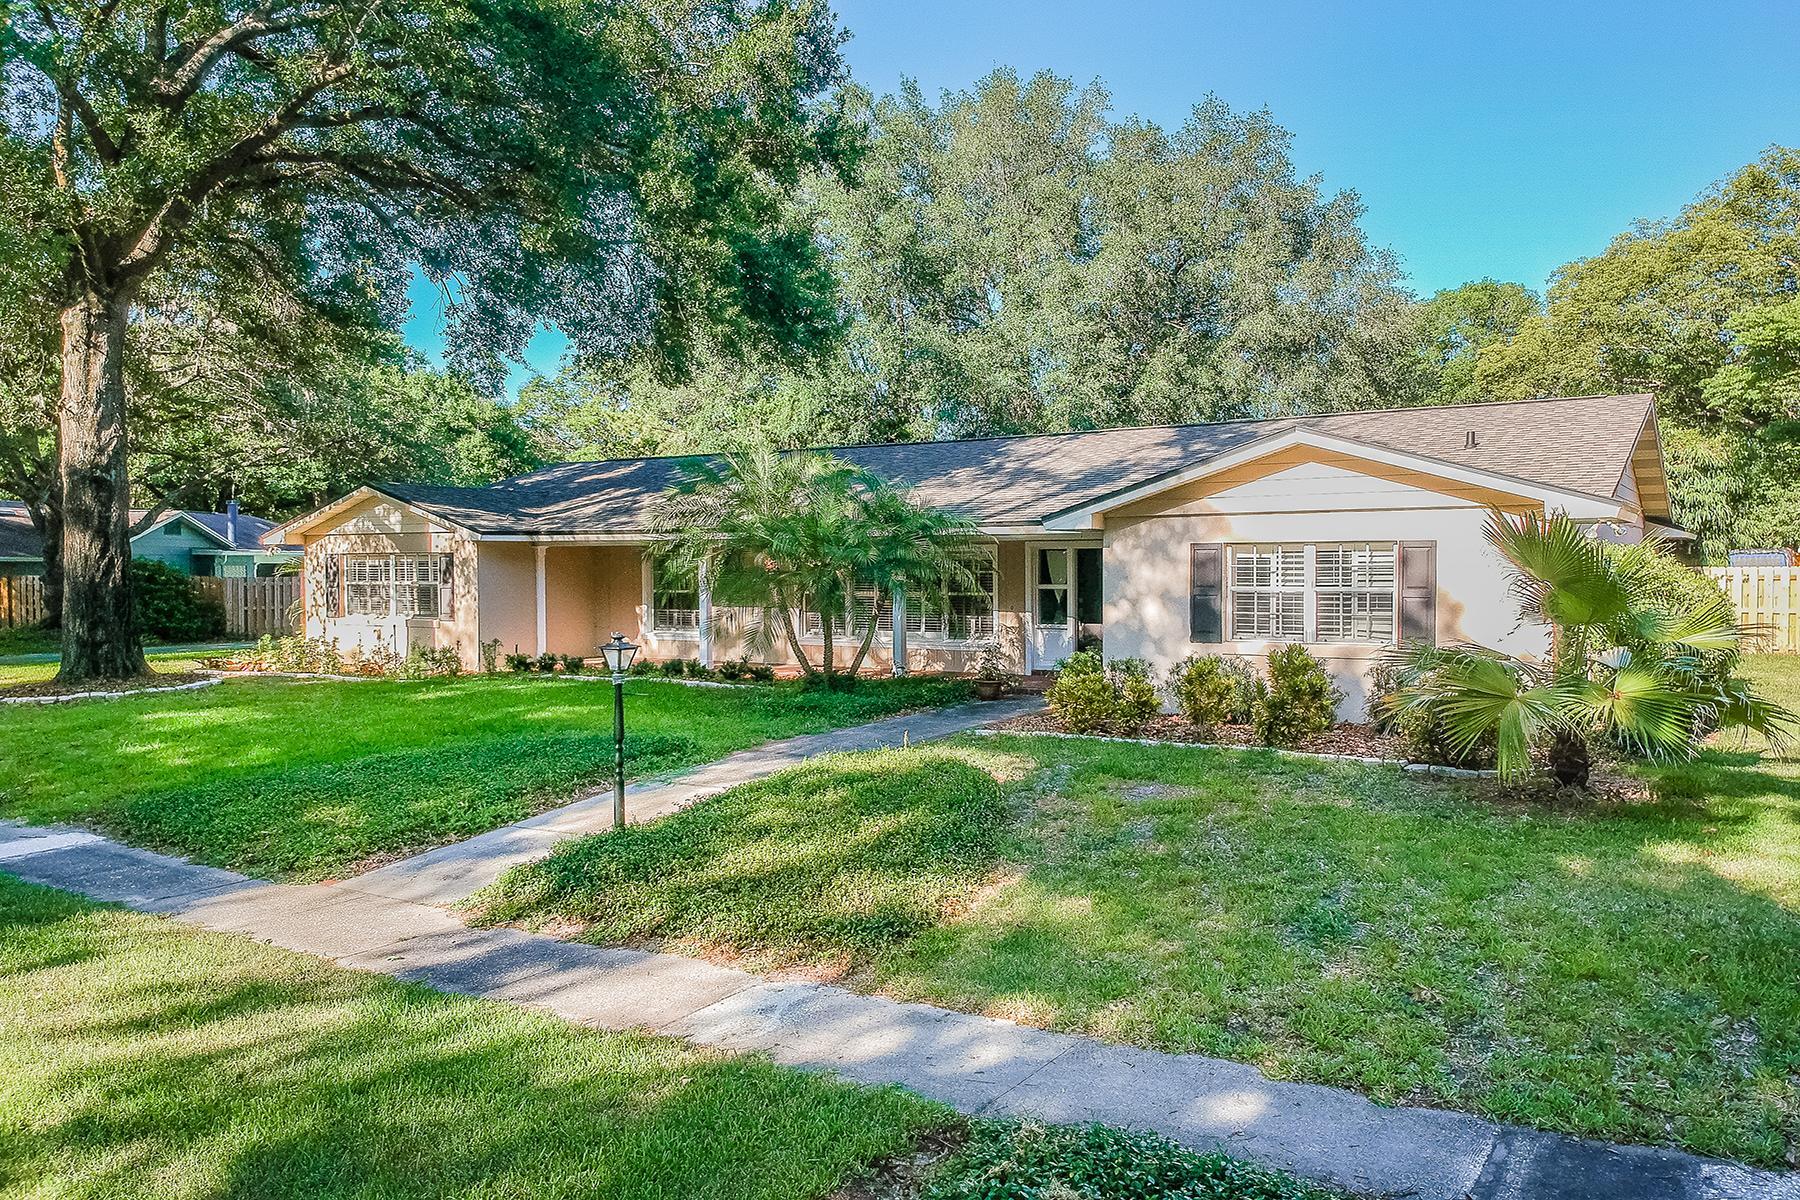 Single Family Homes for Active at MAITLAND 1630 King Arthur Cir Maitland, Florida 32751 United States